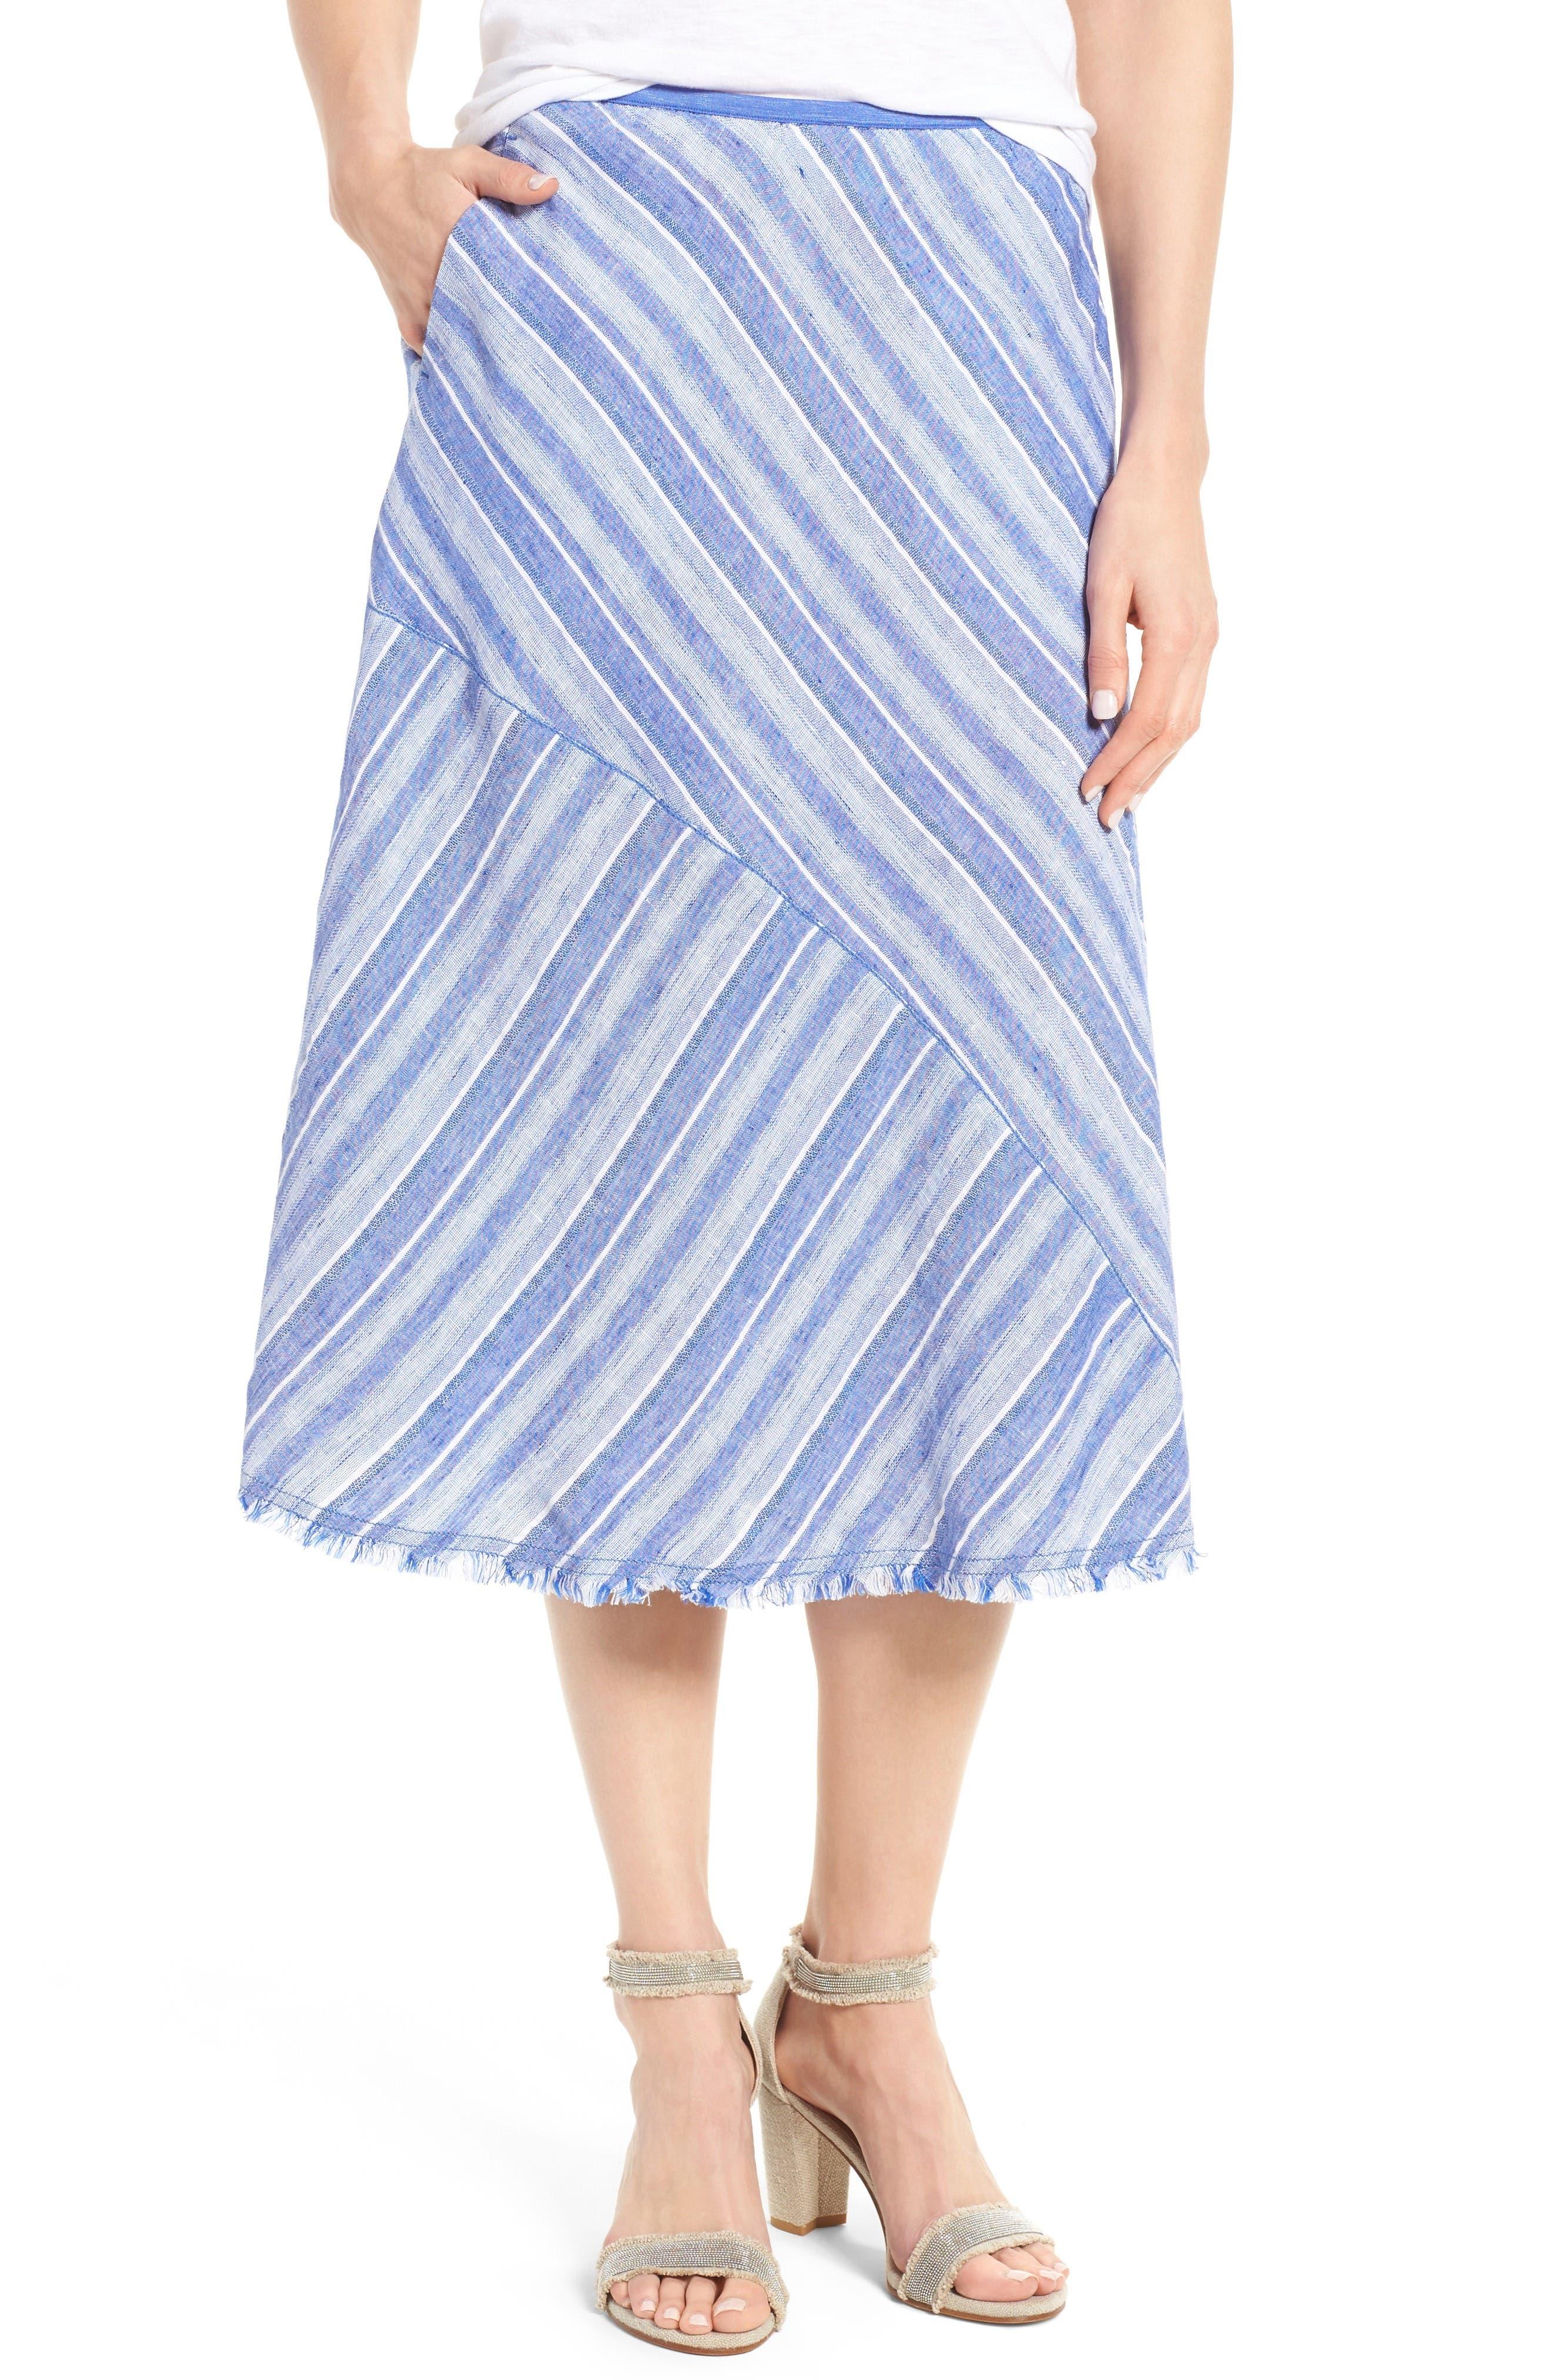 Alternate Image 1 Selected - NIC+ZOE Freshwater A-Line Skirt